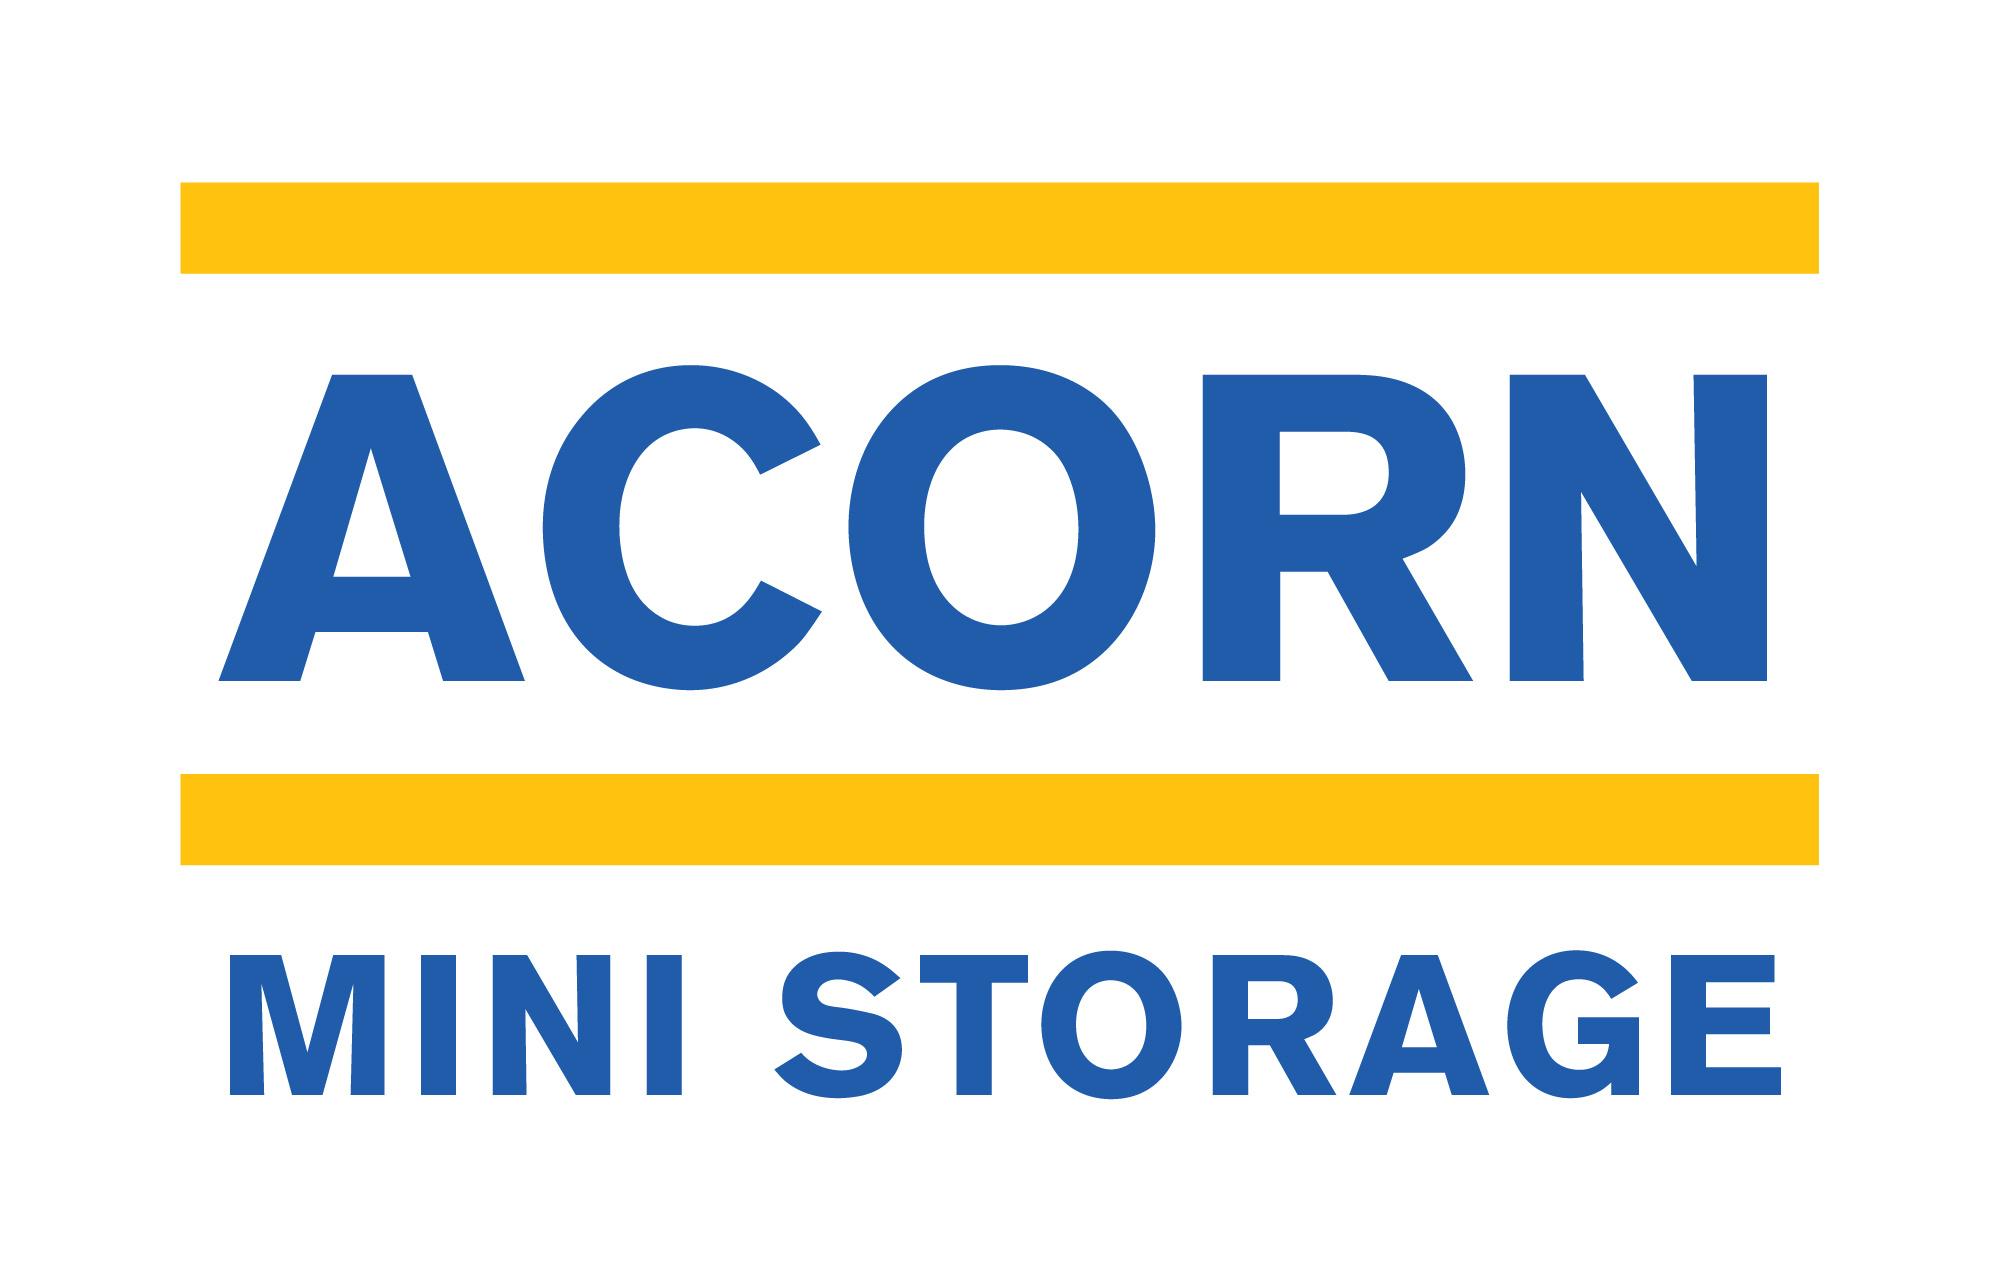 Acorn mini storage logo